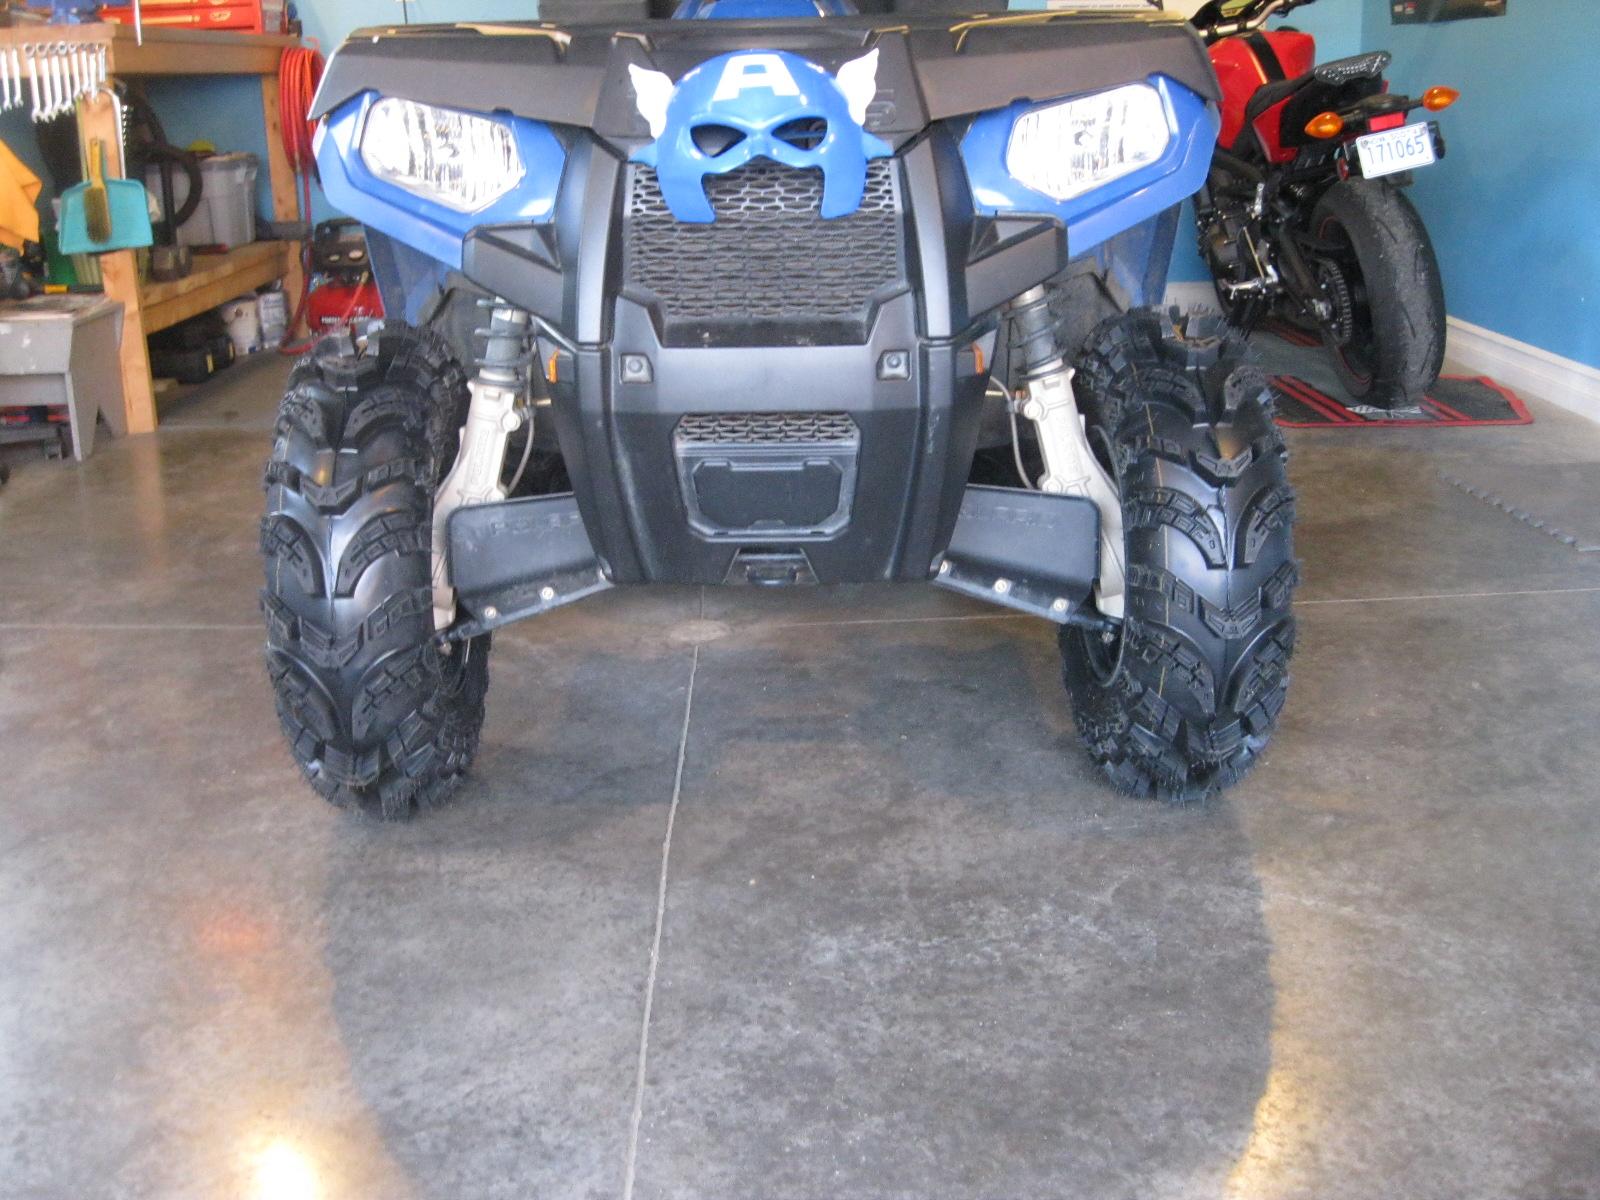 D Ams Slingshot Xt Tires Img on Omc Fuel Filter Location